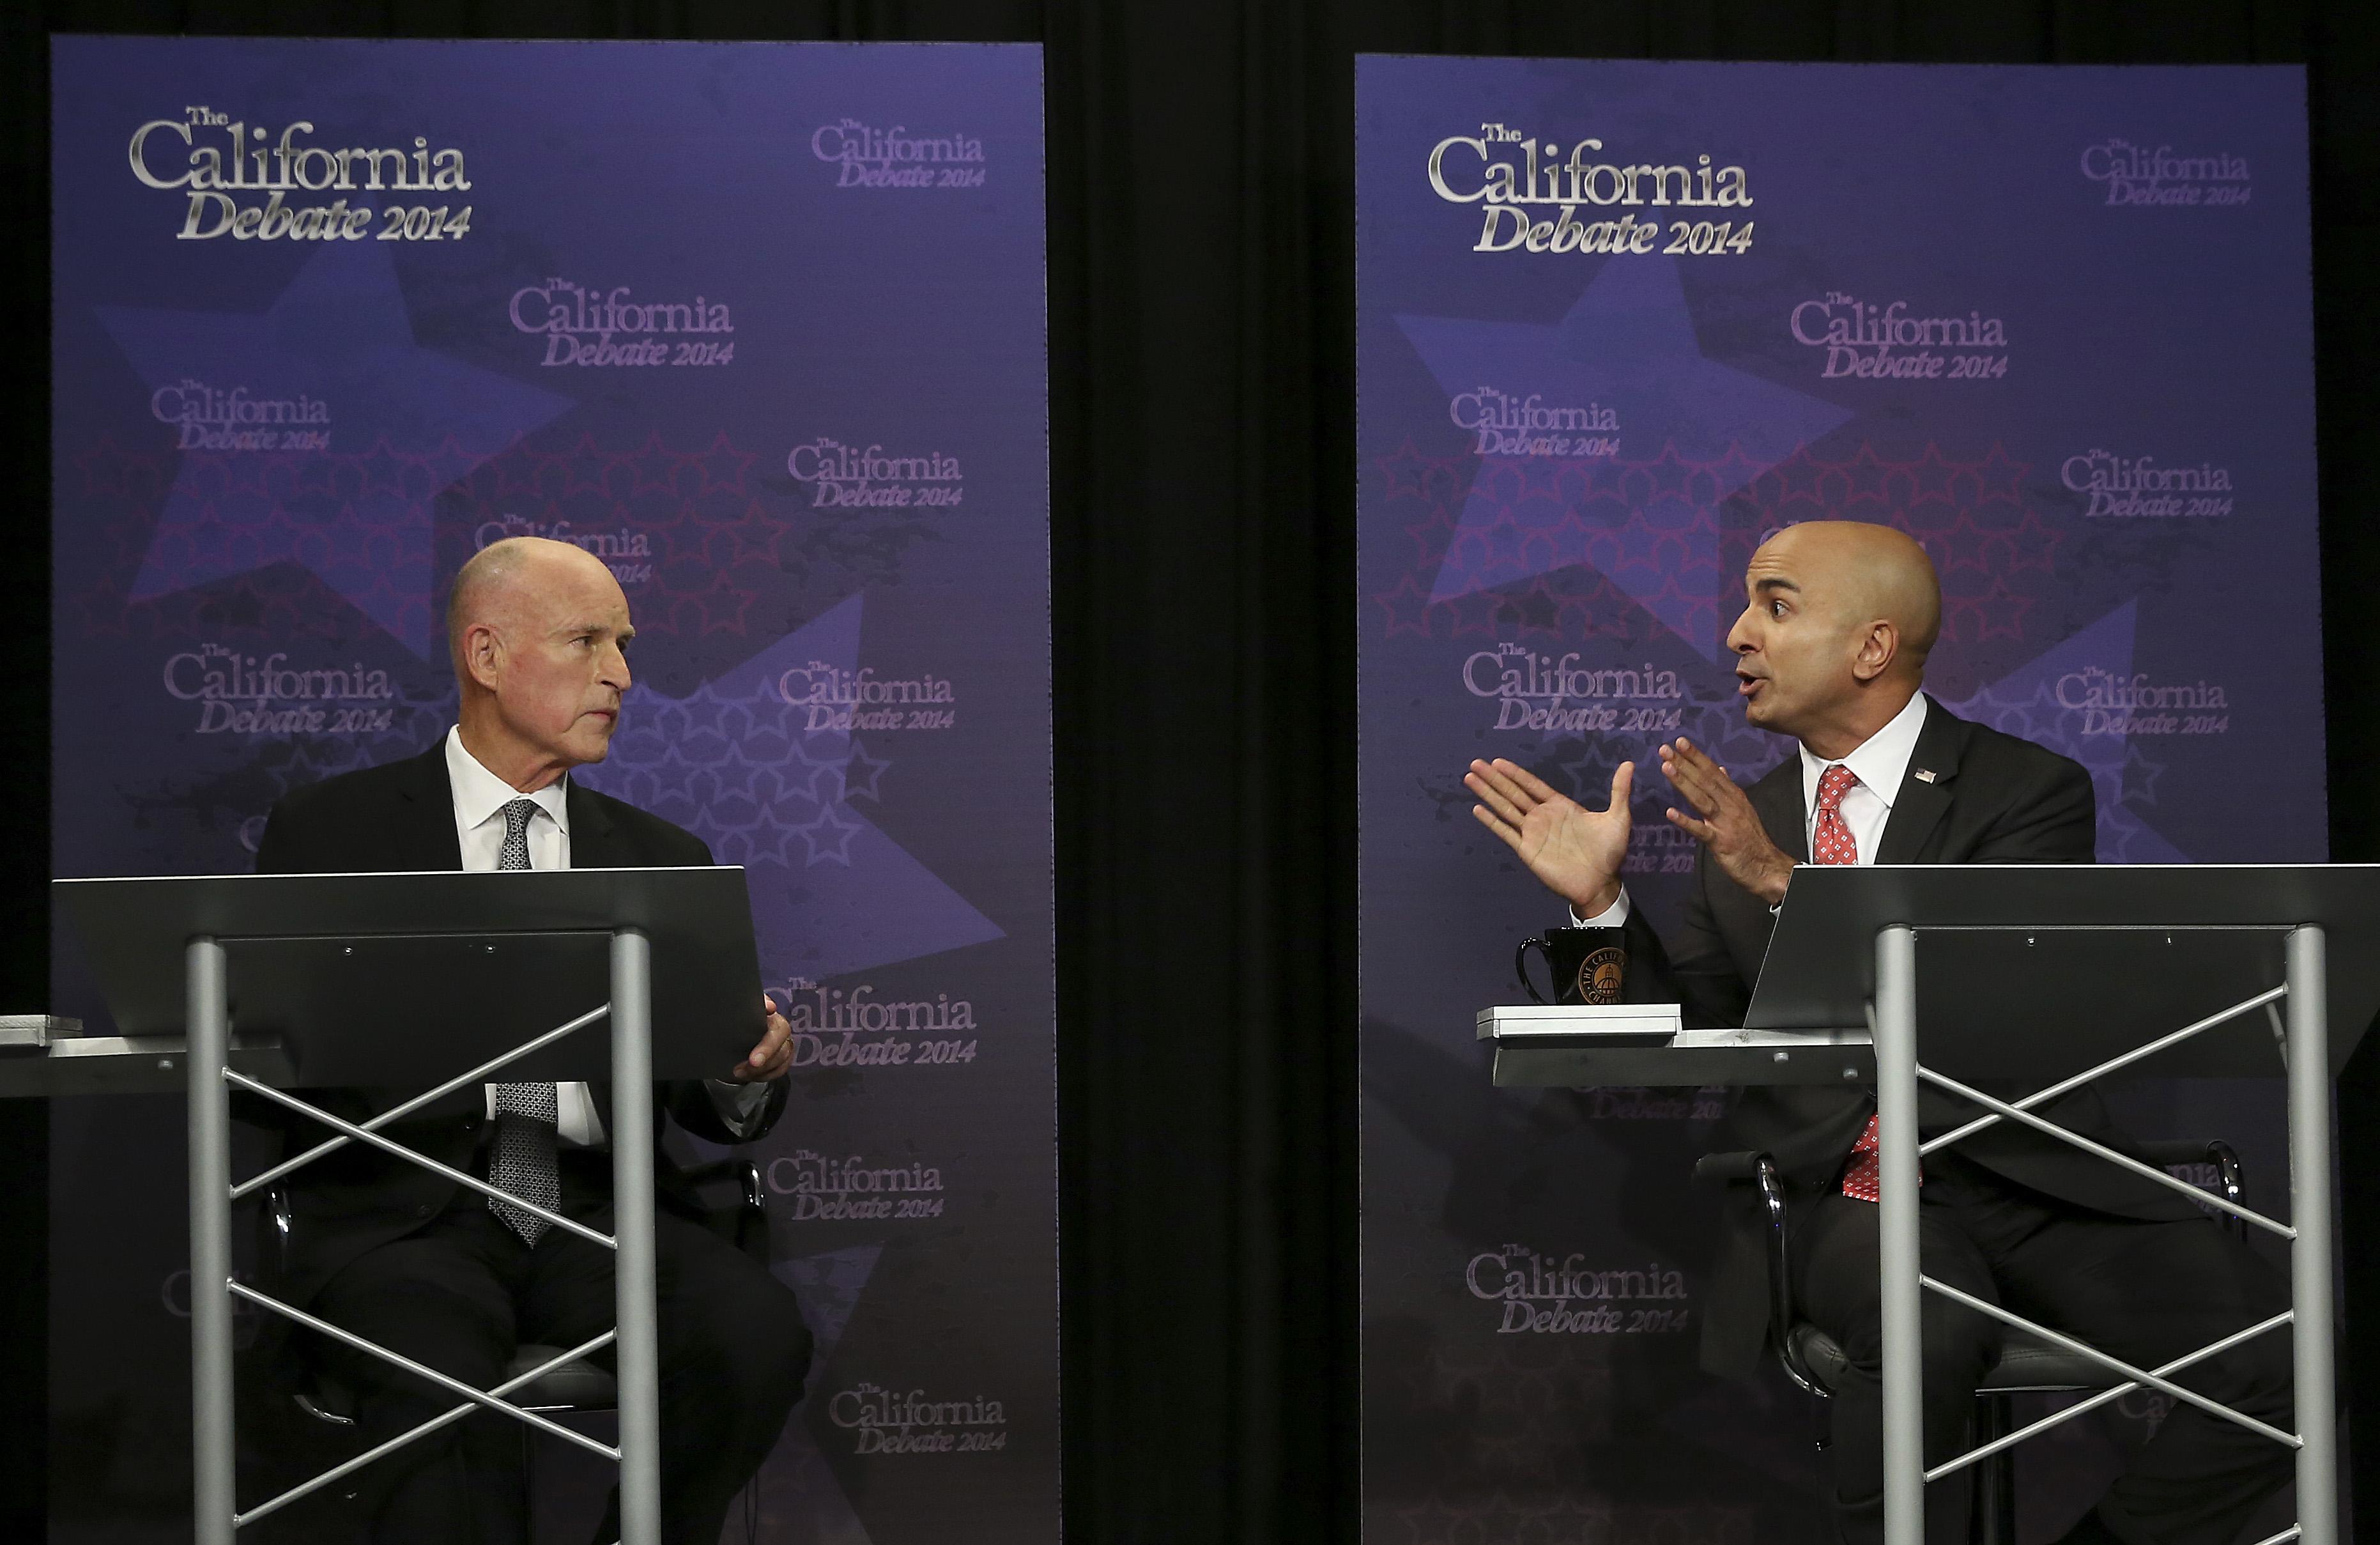 California Governor JerryBrown, left, listens as Republican challenger Neel Kashkari speaks during a gubernatorial debate in Sacramento, Calif., on Sept. 4, 2014